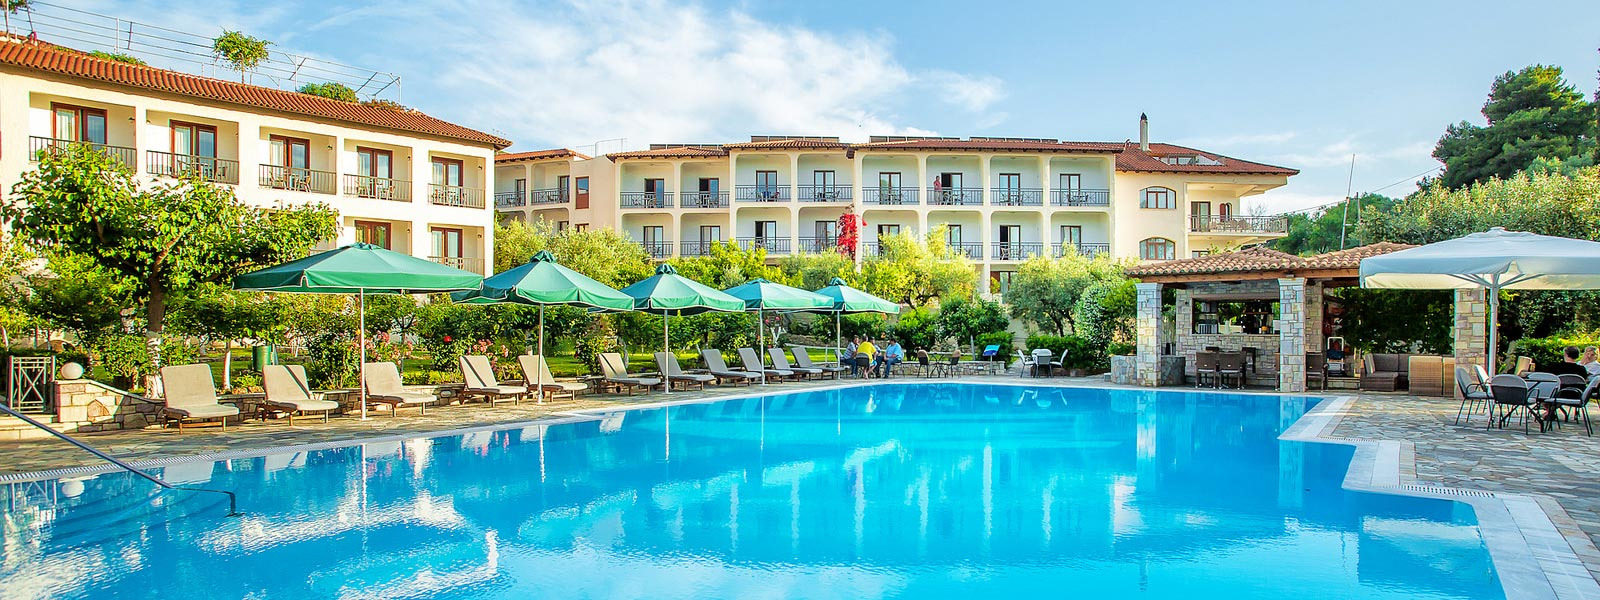 Europa Hotel Olympia